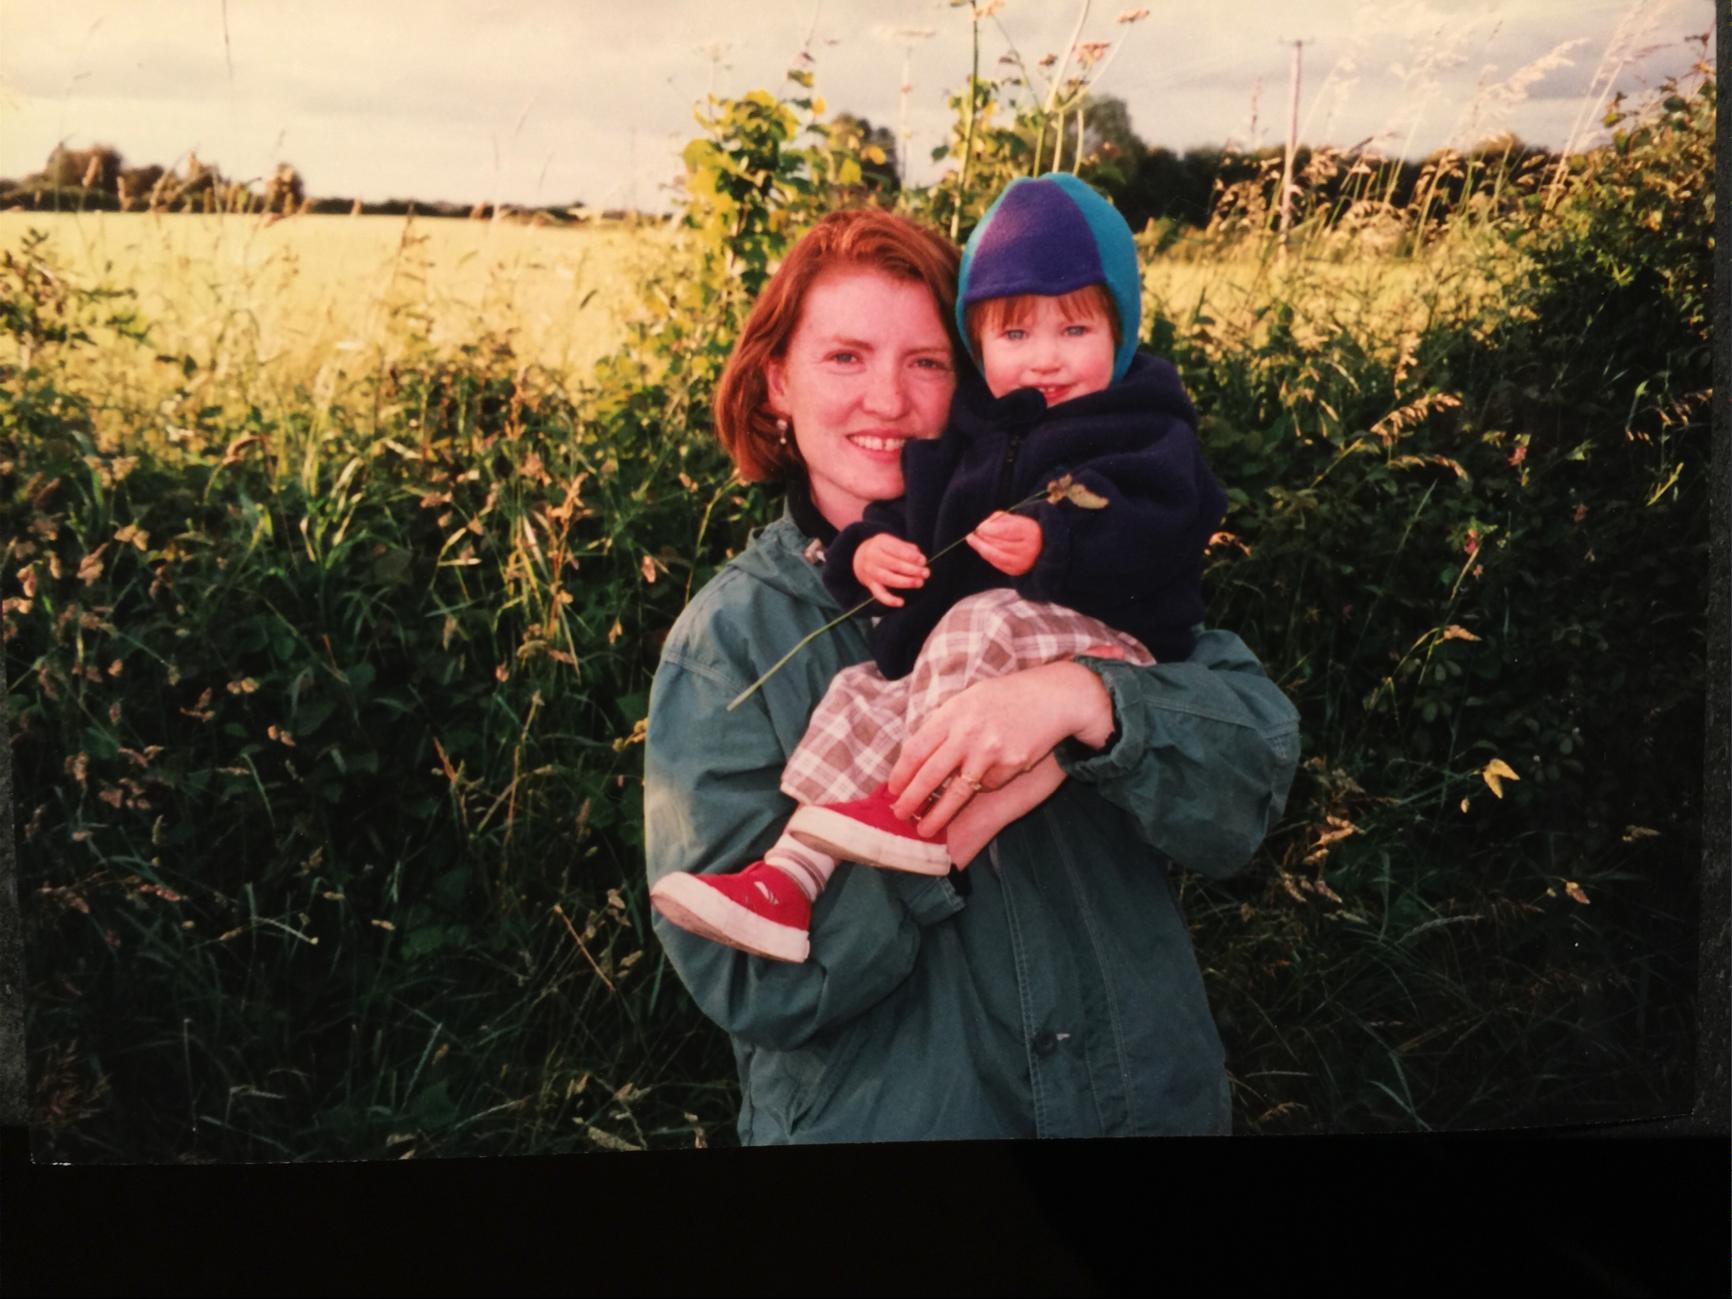 County Galway, Ireland. Summer 1996.